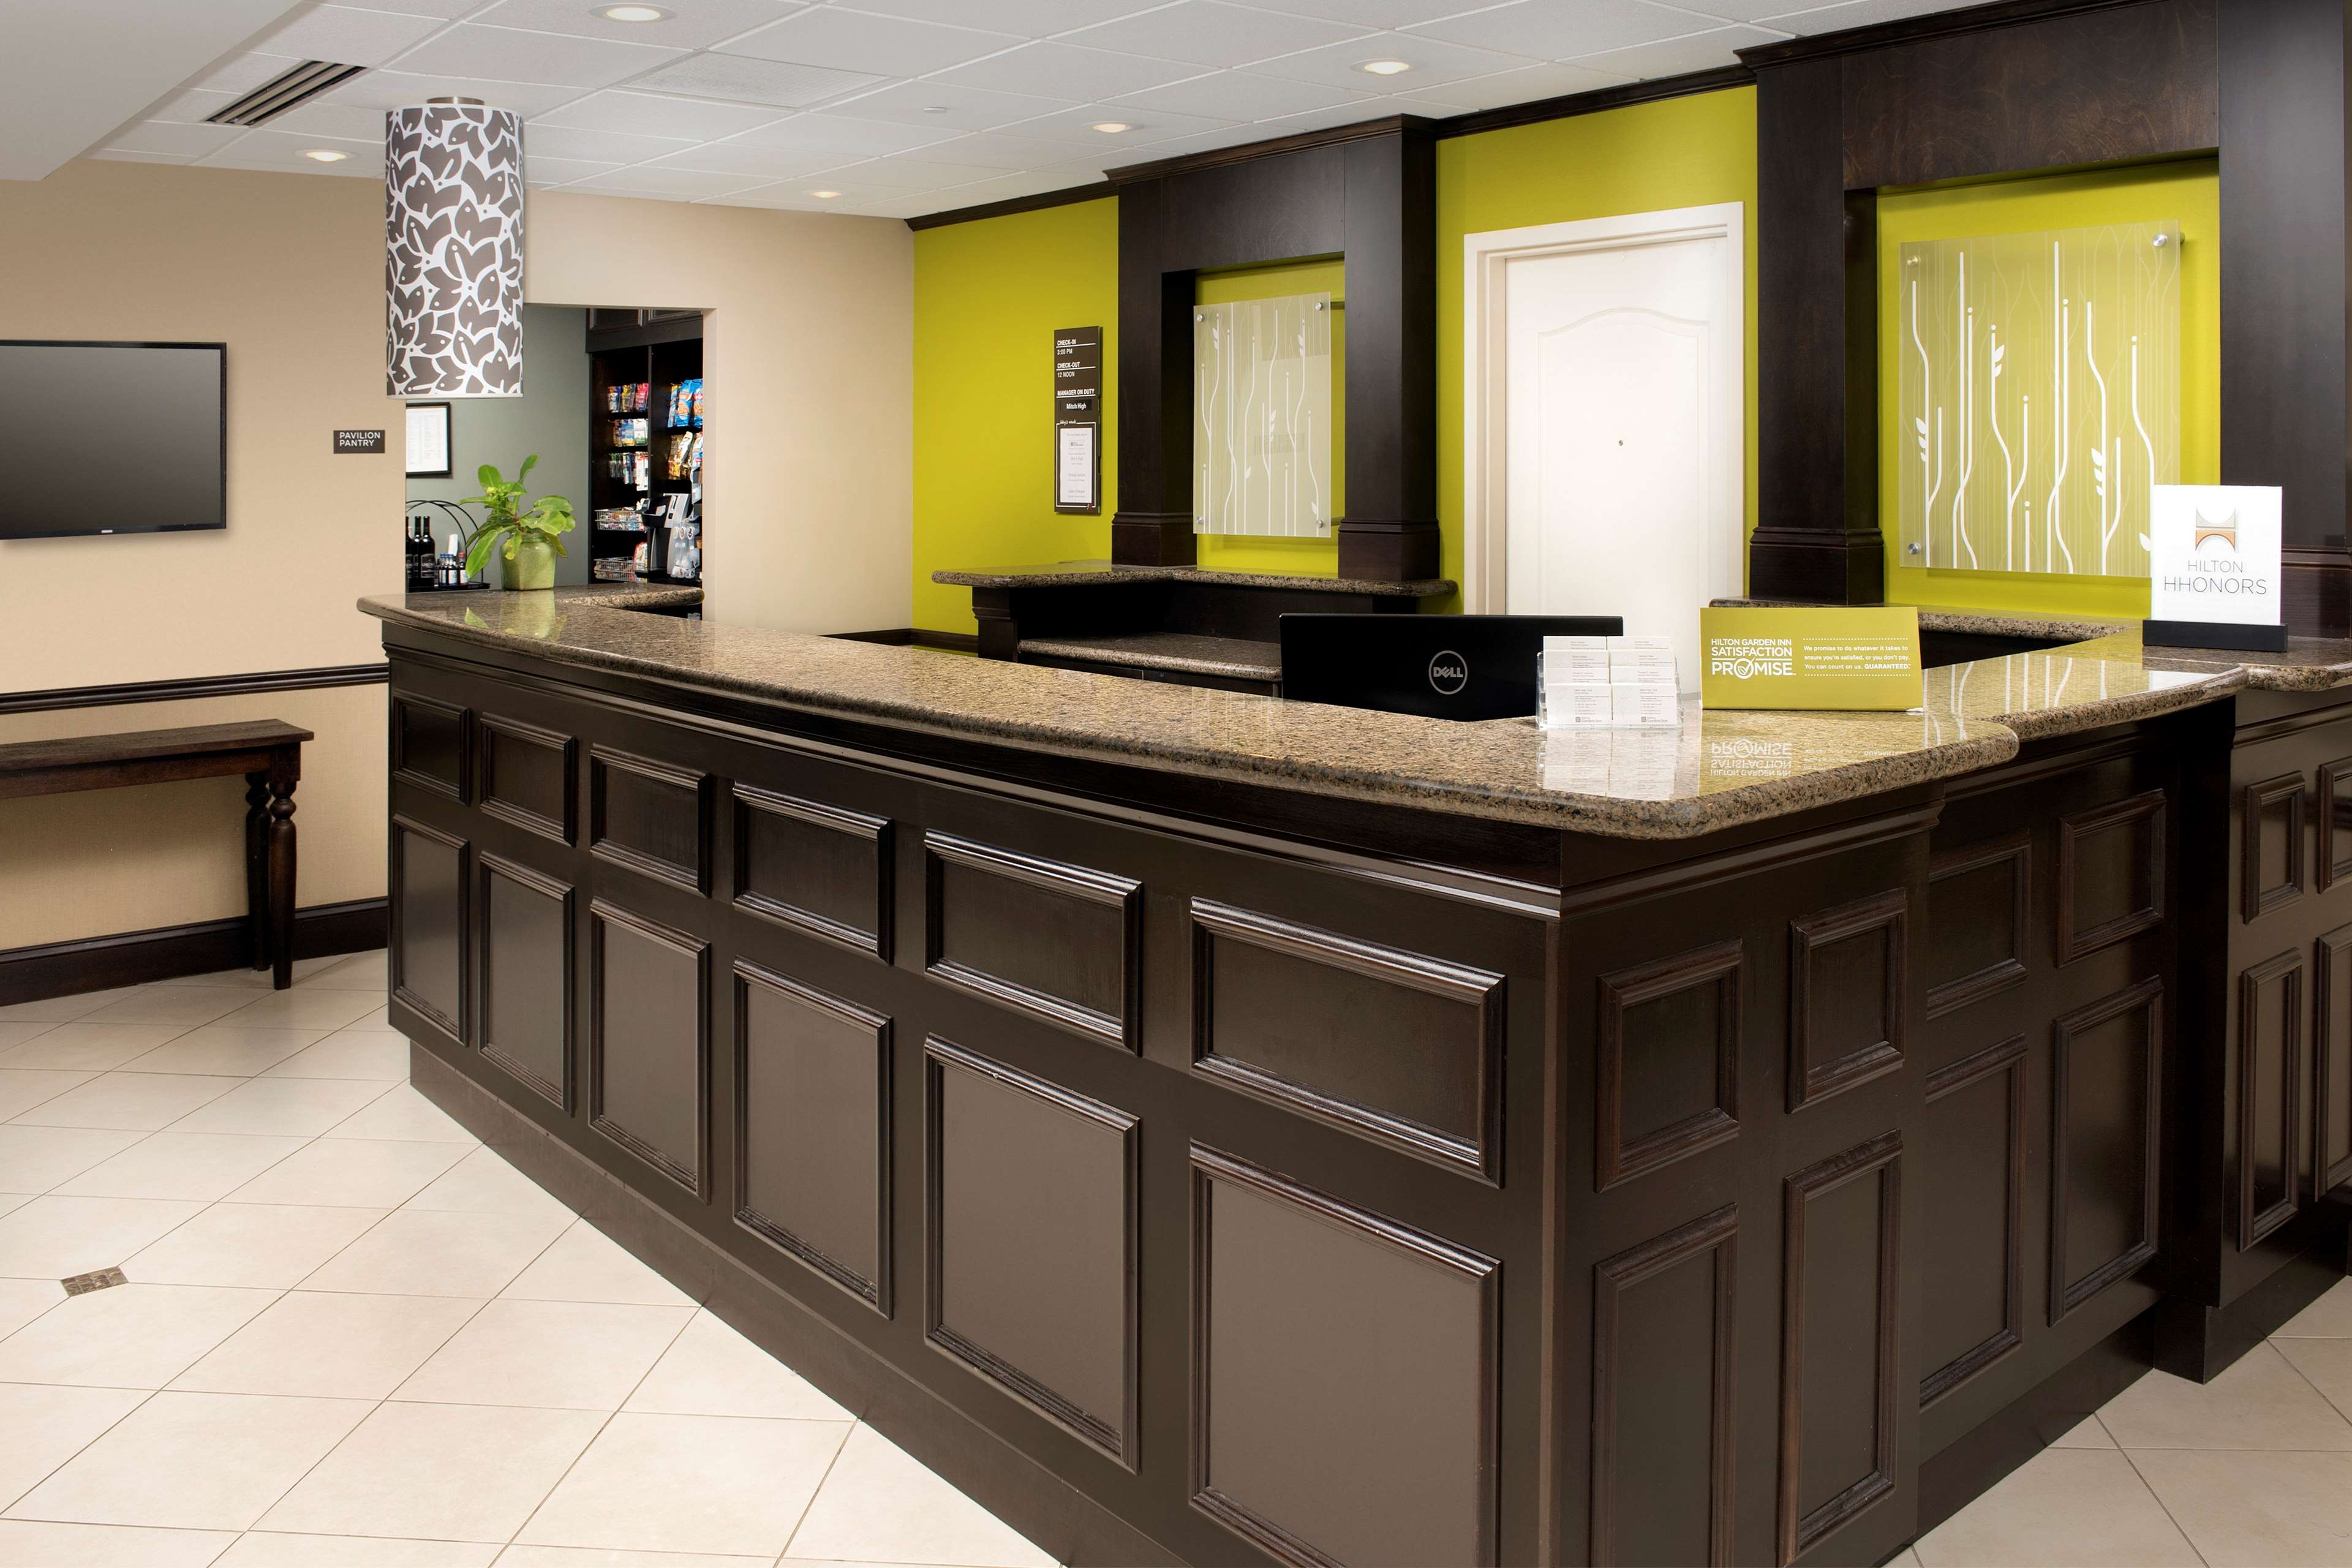 Hilton Garden Inn Winston-Salem/Hanes Mall image 4